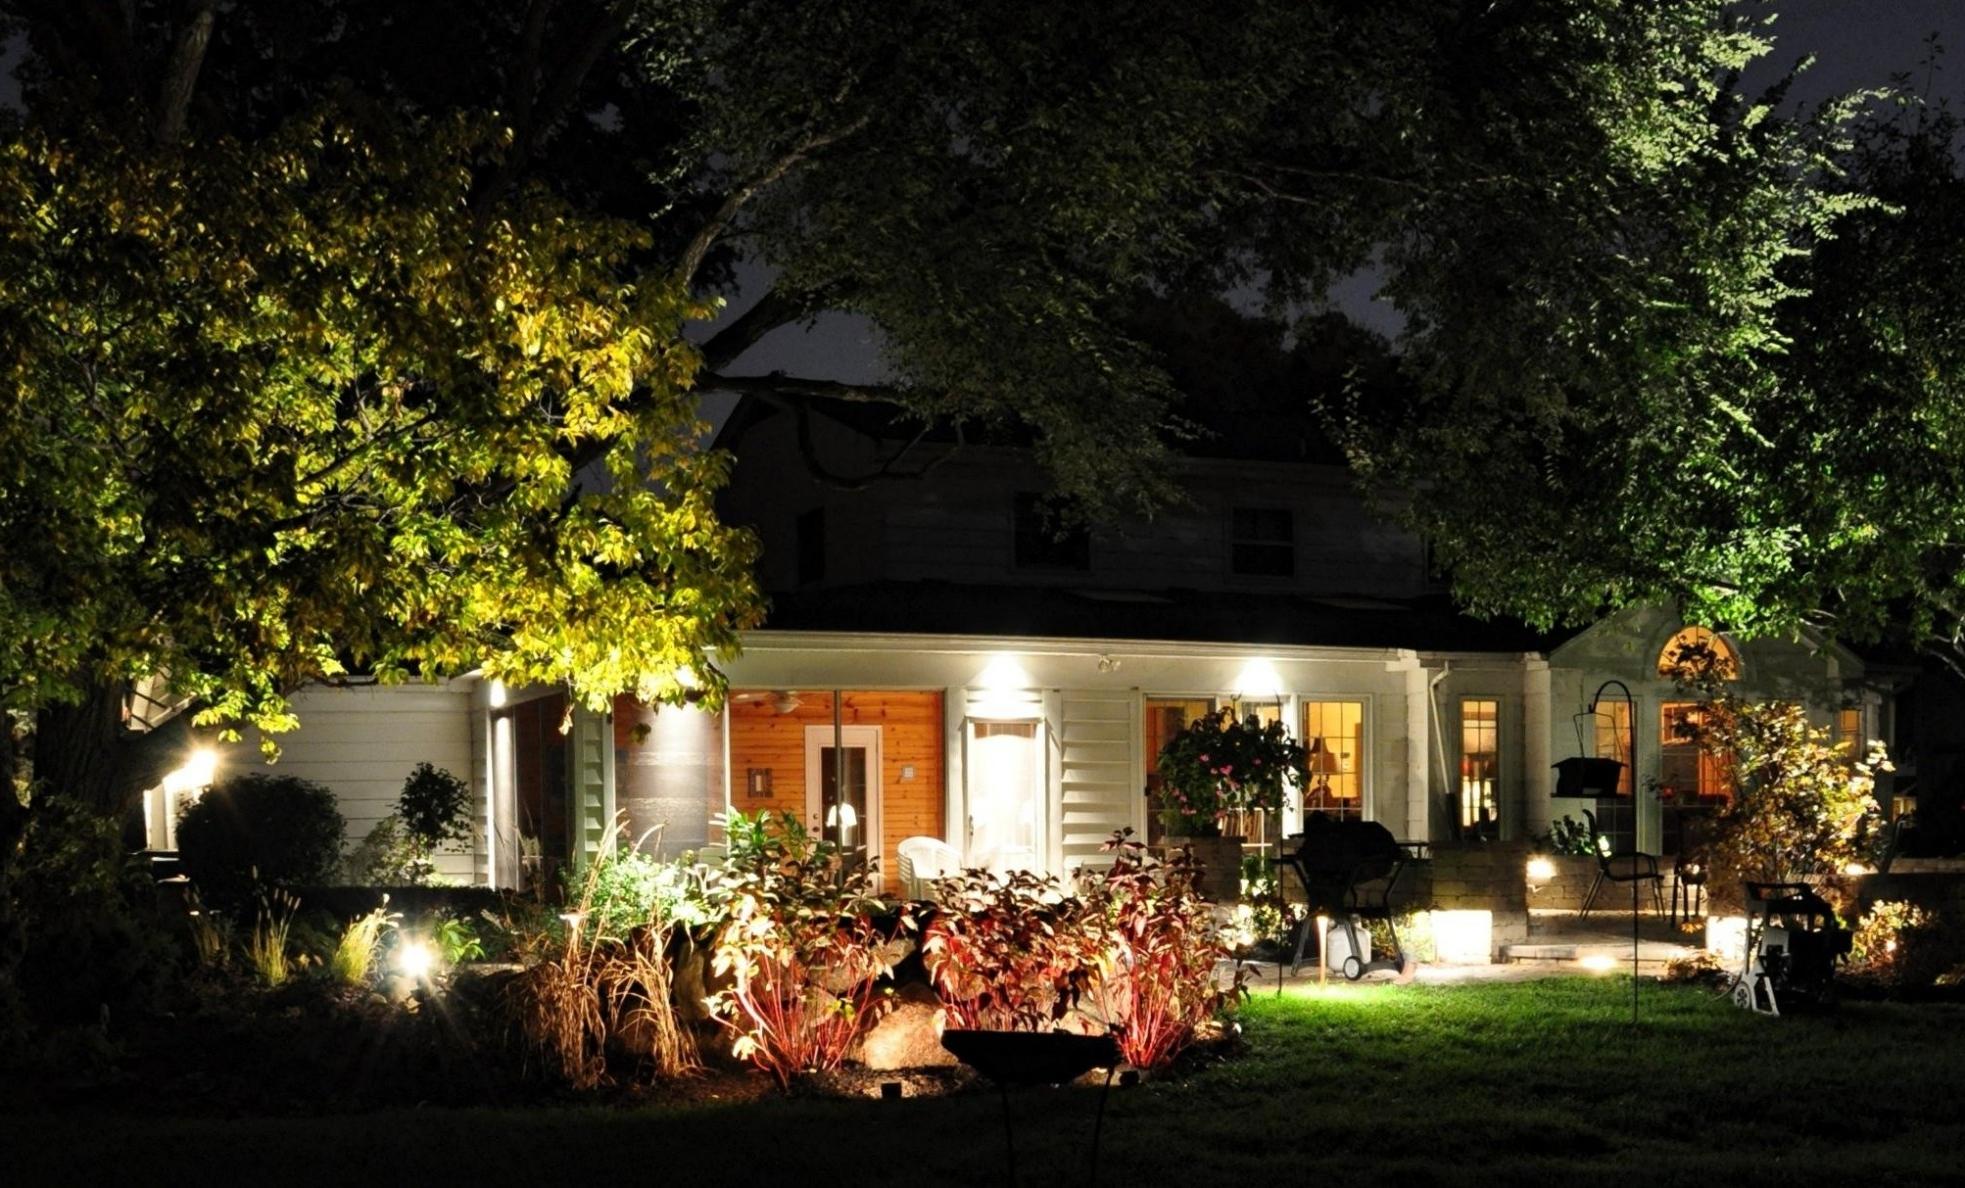 Well Liked Kichler Landscape Lights — Foothillfolk Designs With Regard To Outdoor Landscape Lanterns (View 15 of 20)